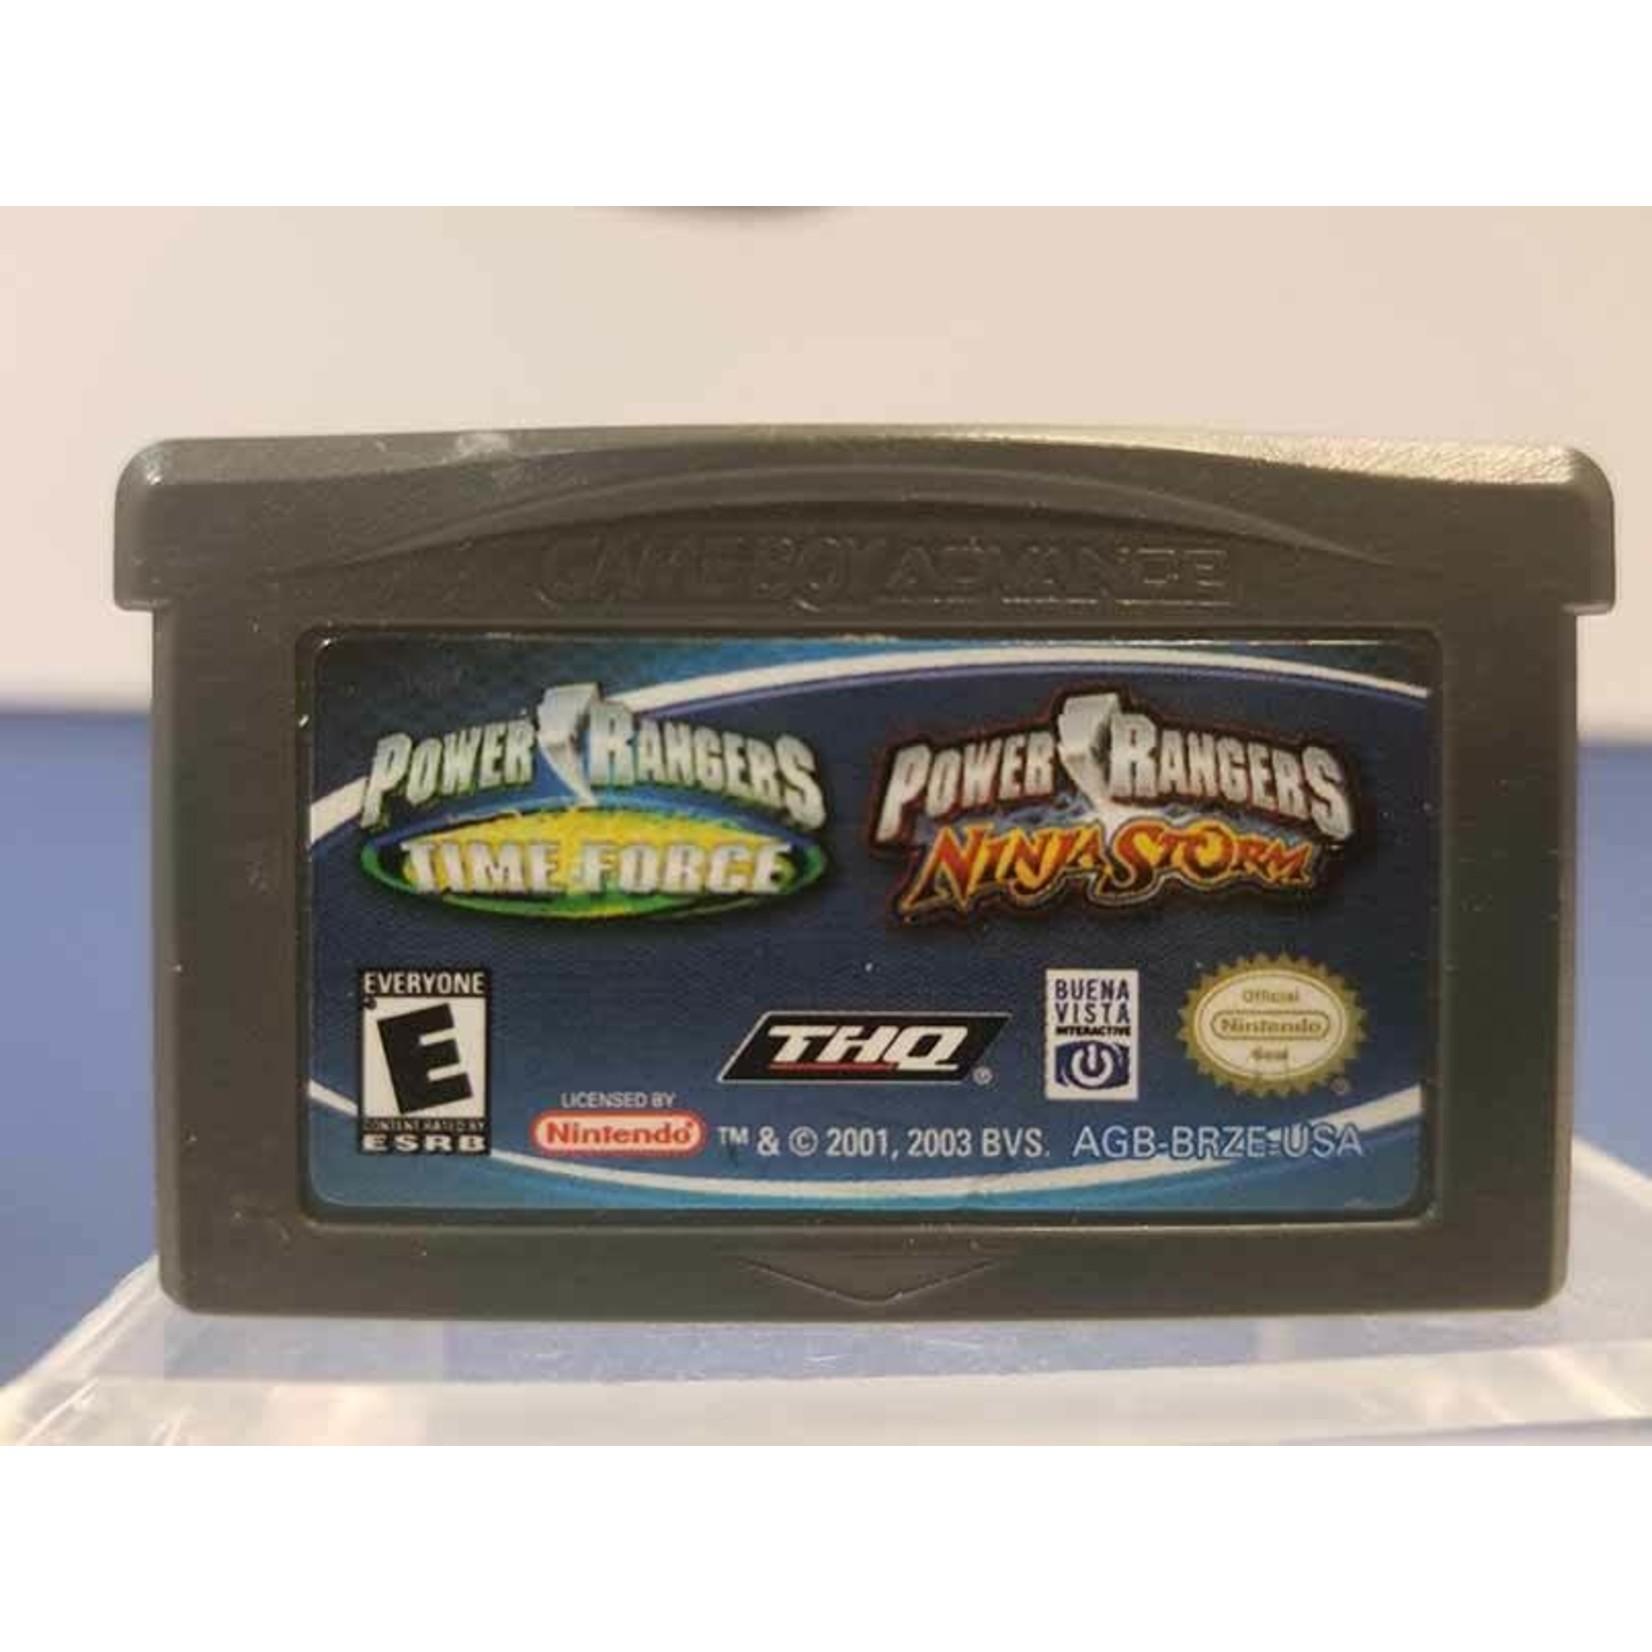 GBAU-Power Rangers Time Force & Ninja Storm